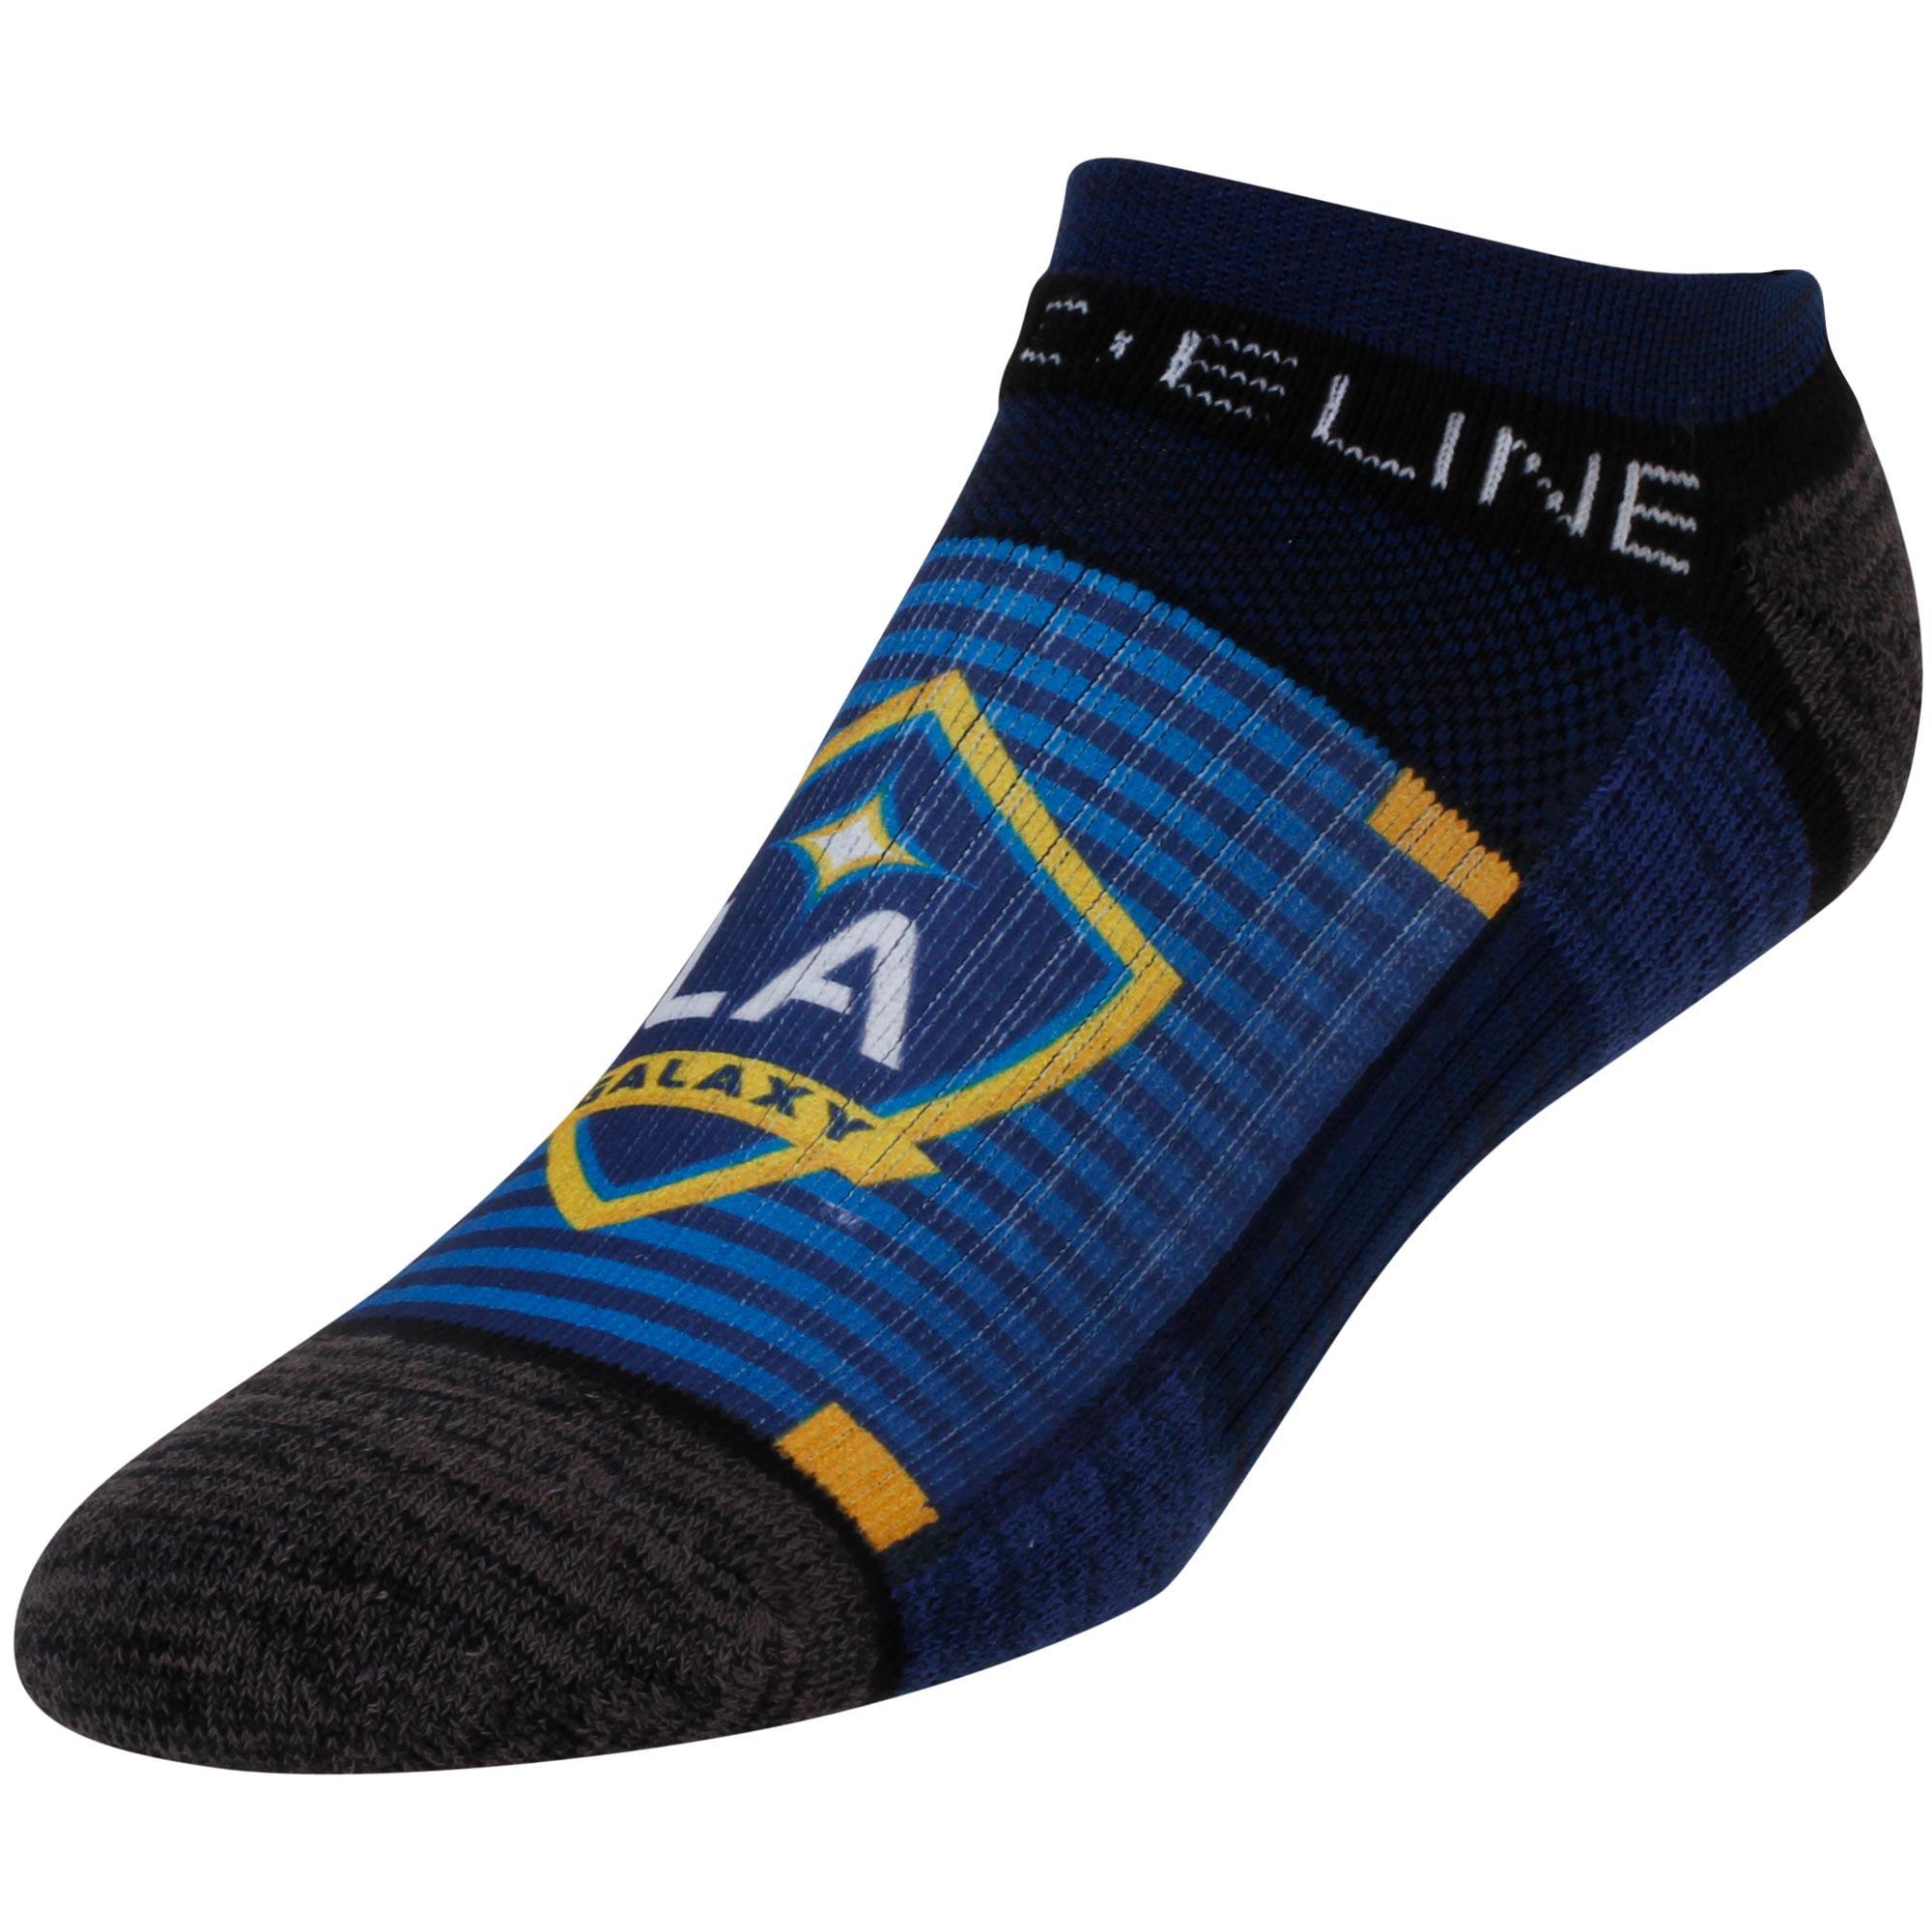 LA Galaxy No Show Ankle Socks - Navy - OSFA